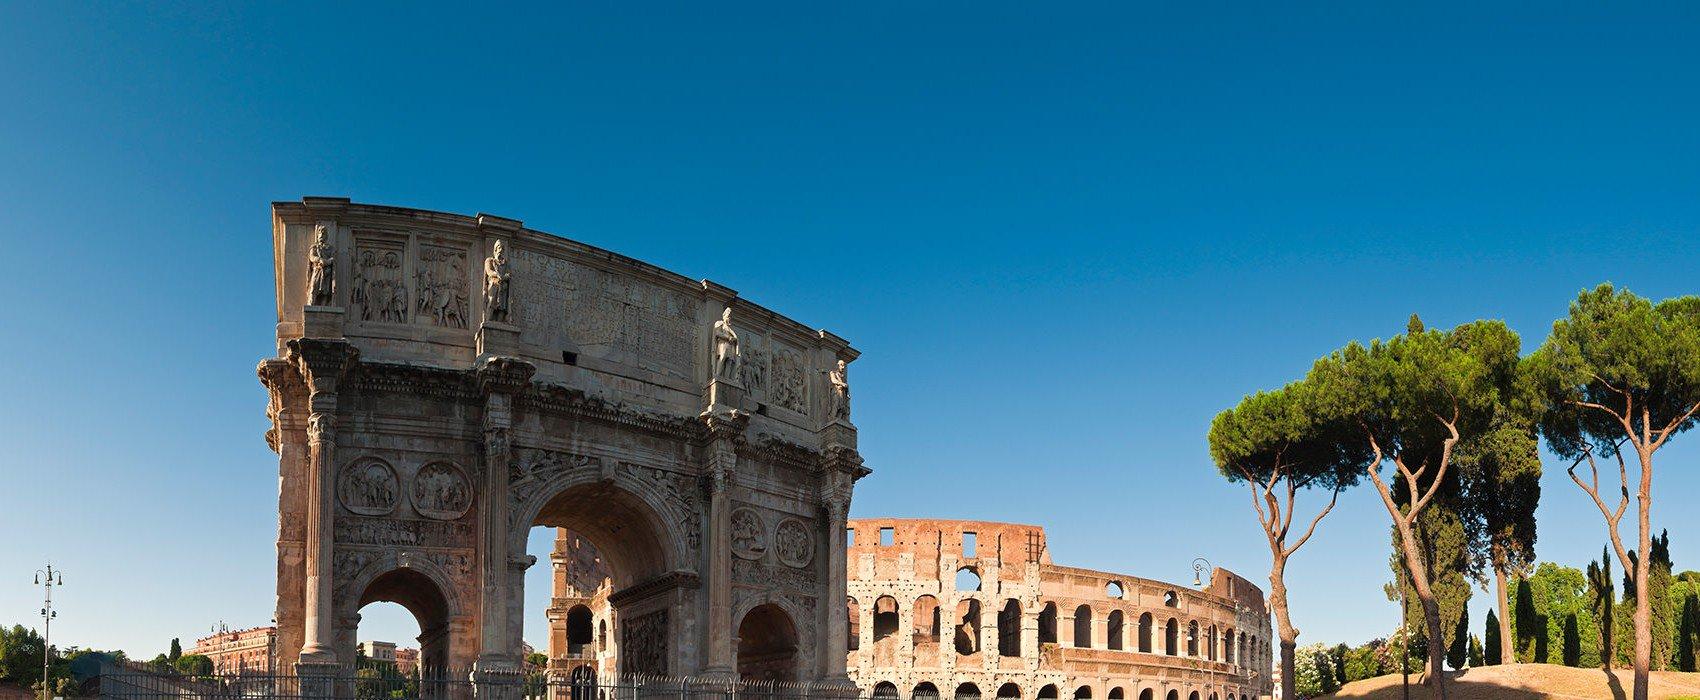 Italy Student Visa from Nigeria